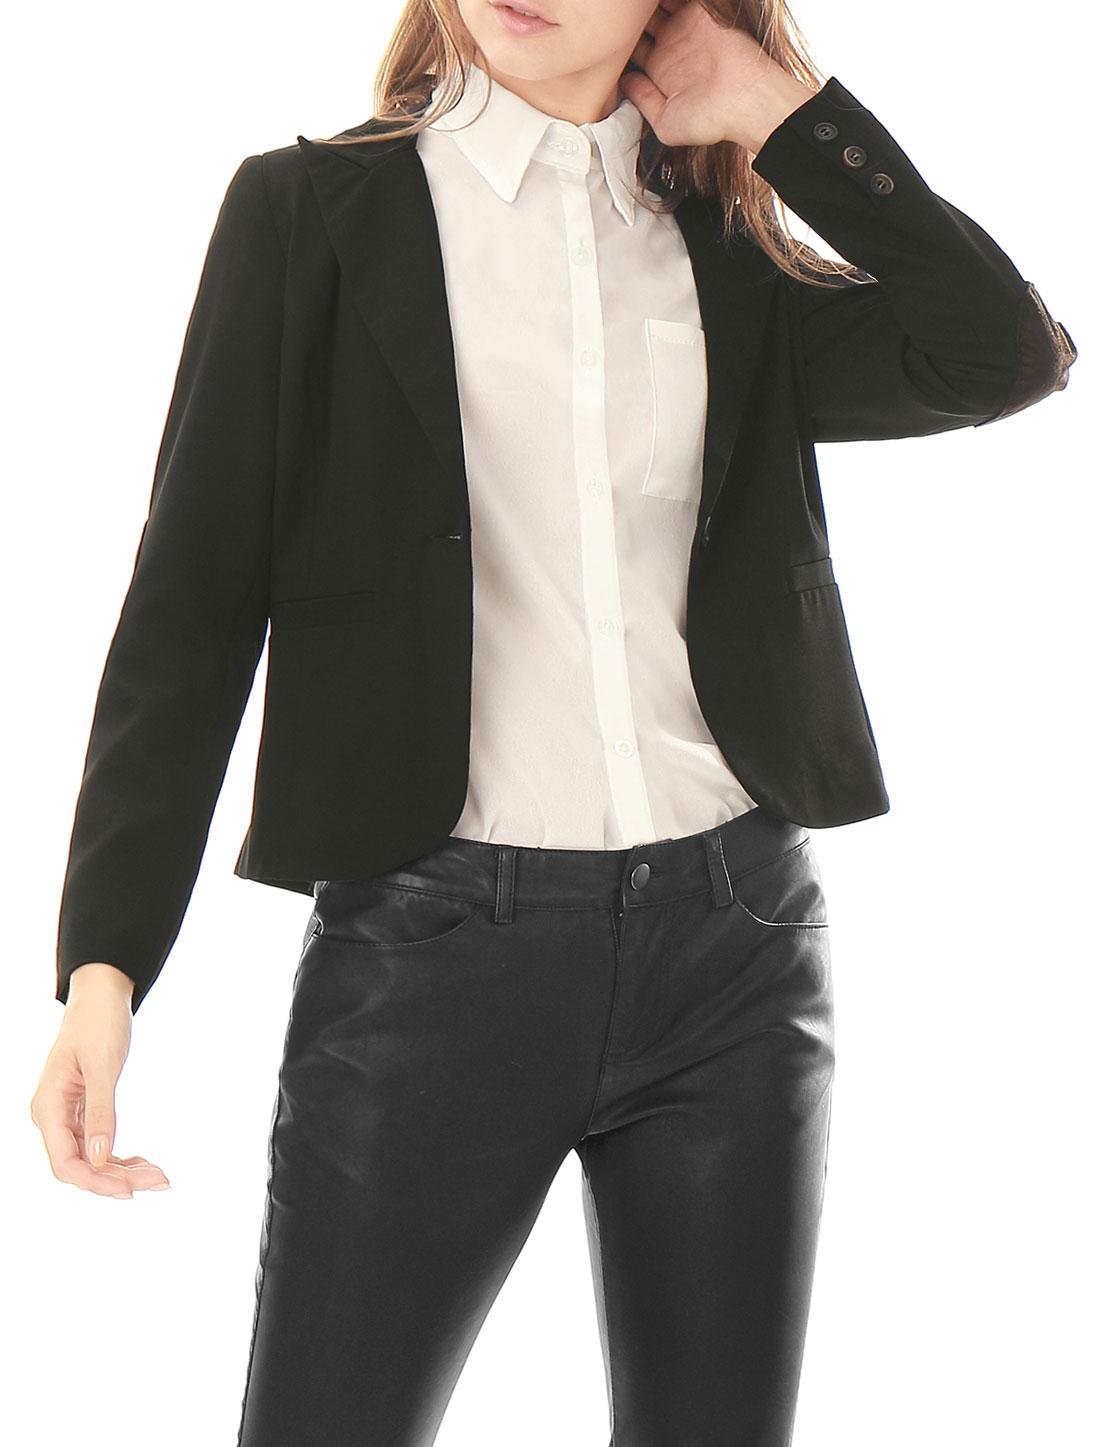 Allegra K Women Peaked Lapel One-Button Elbow-Patch Blazer Black L